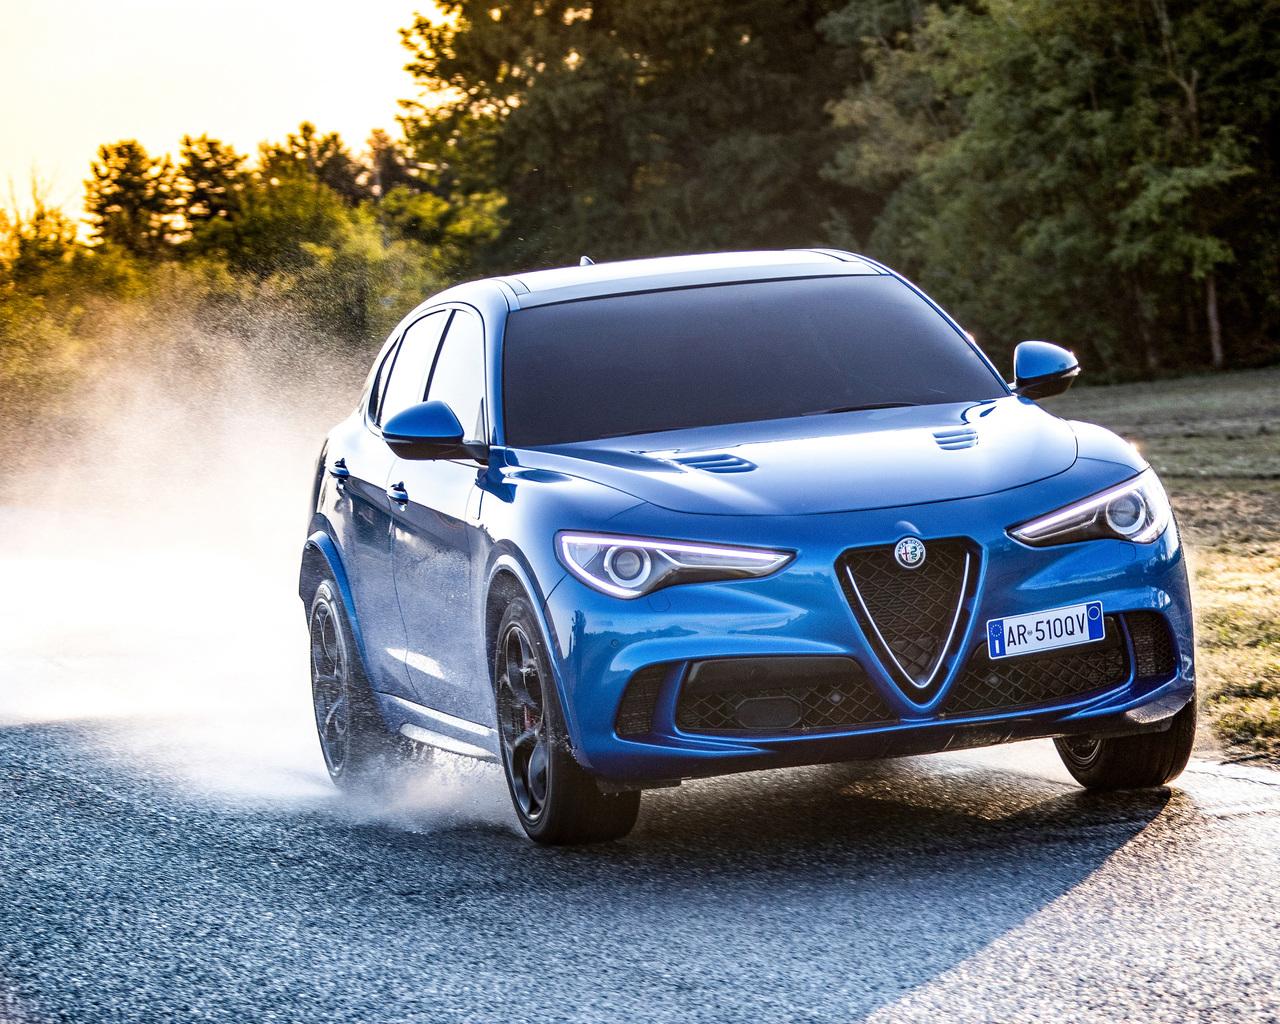 1280x1024 Alfa Romeo Stelvio Quadrifoglio 1280x1024 Resolution Hd